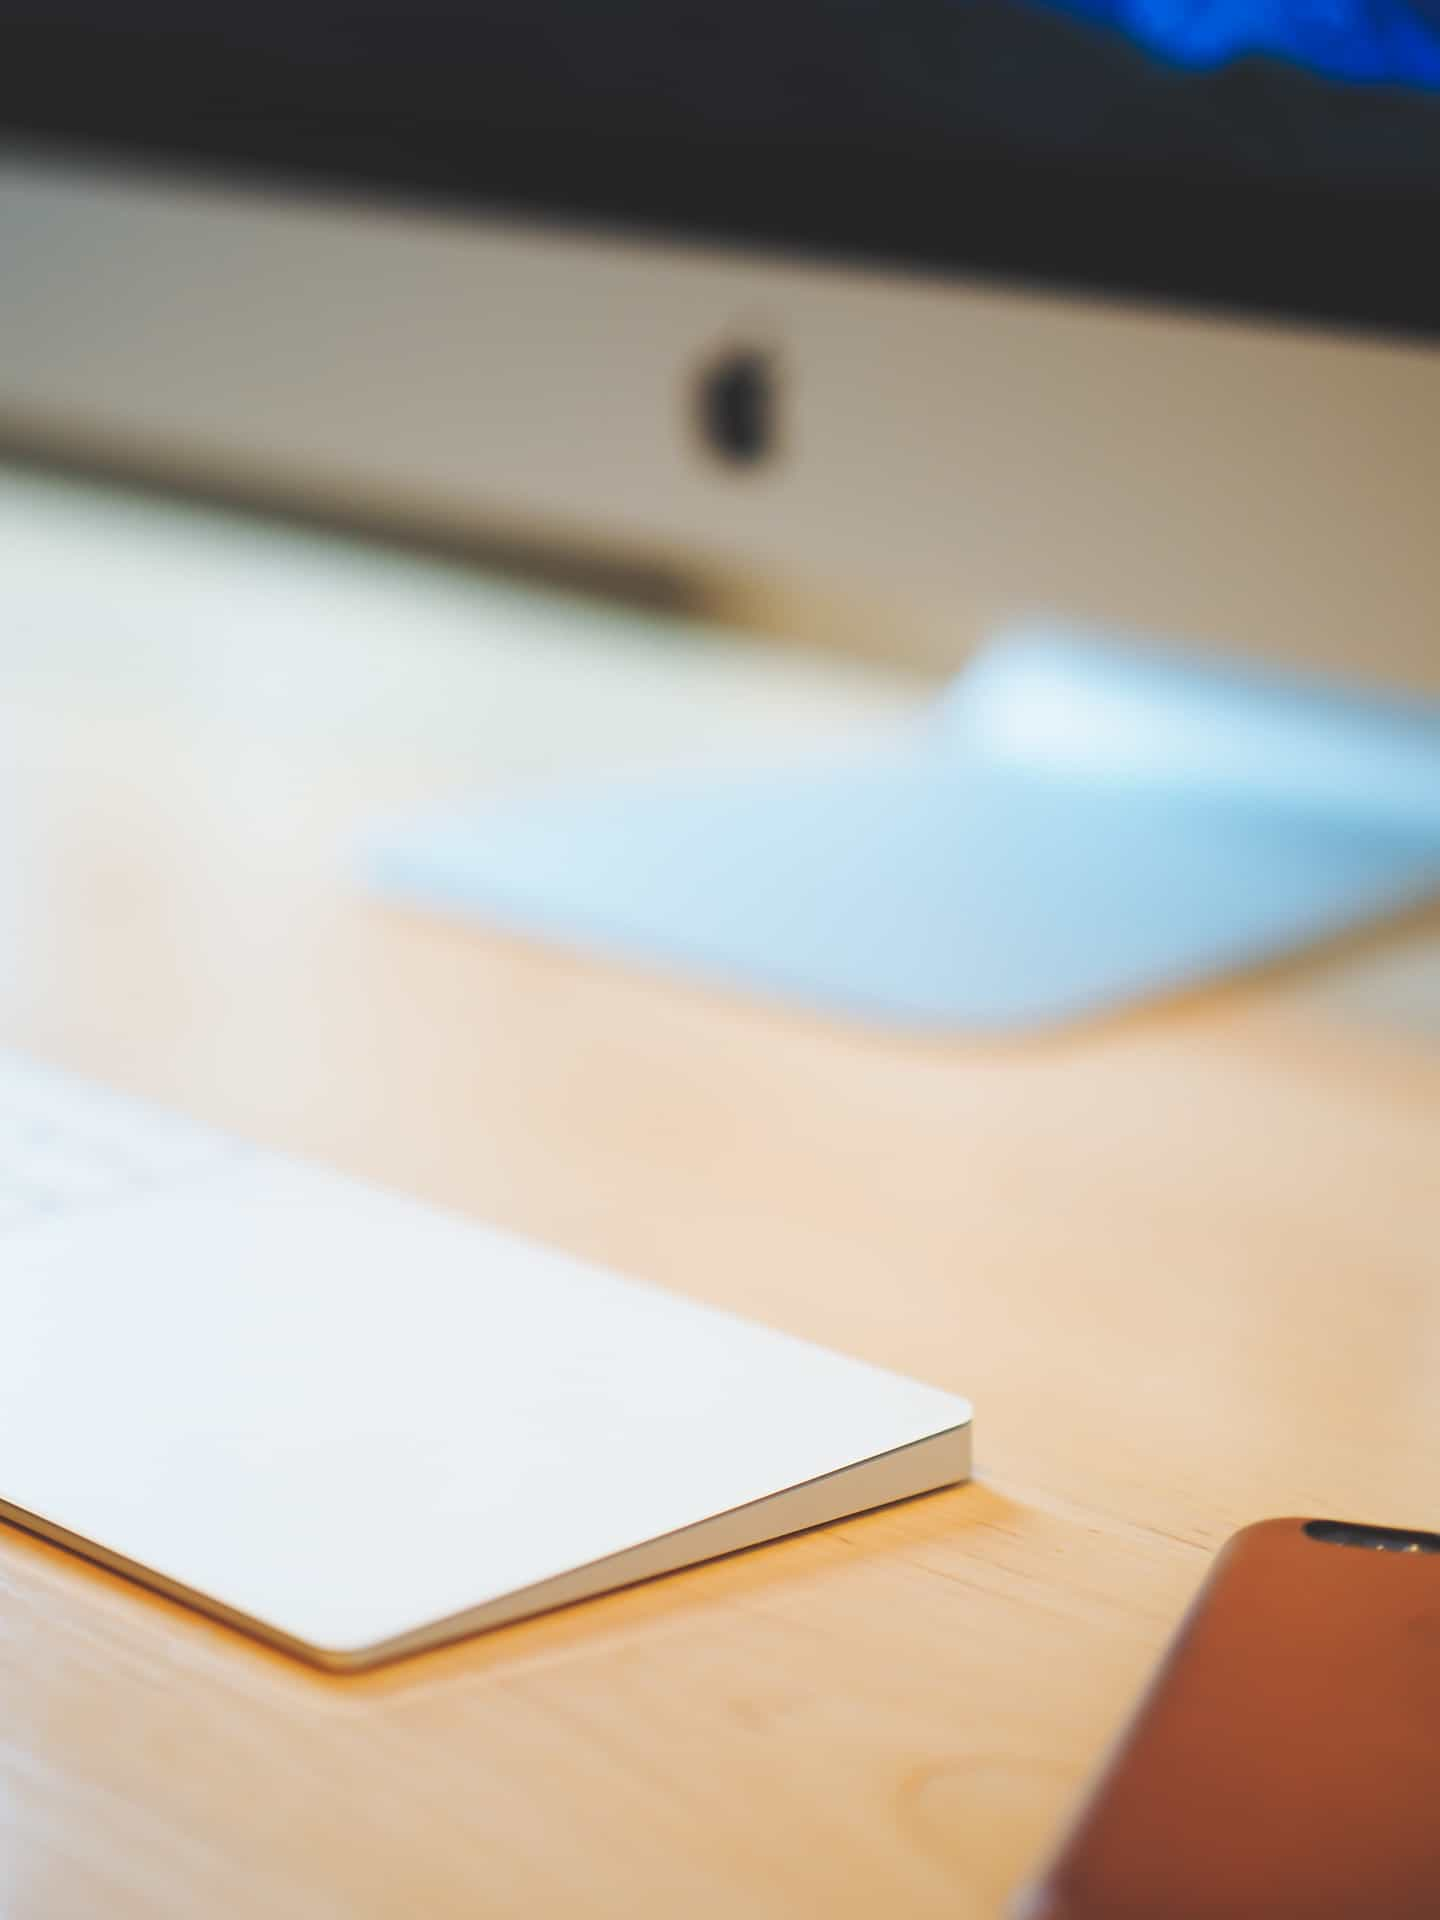 Apple Magic Keyboard and Trackpad 2